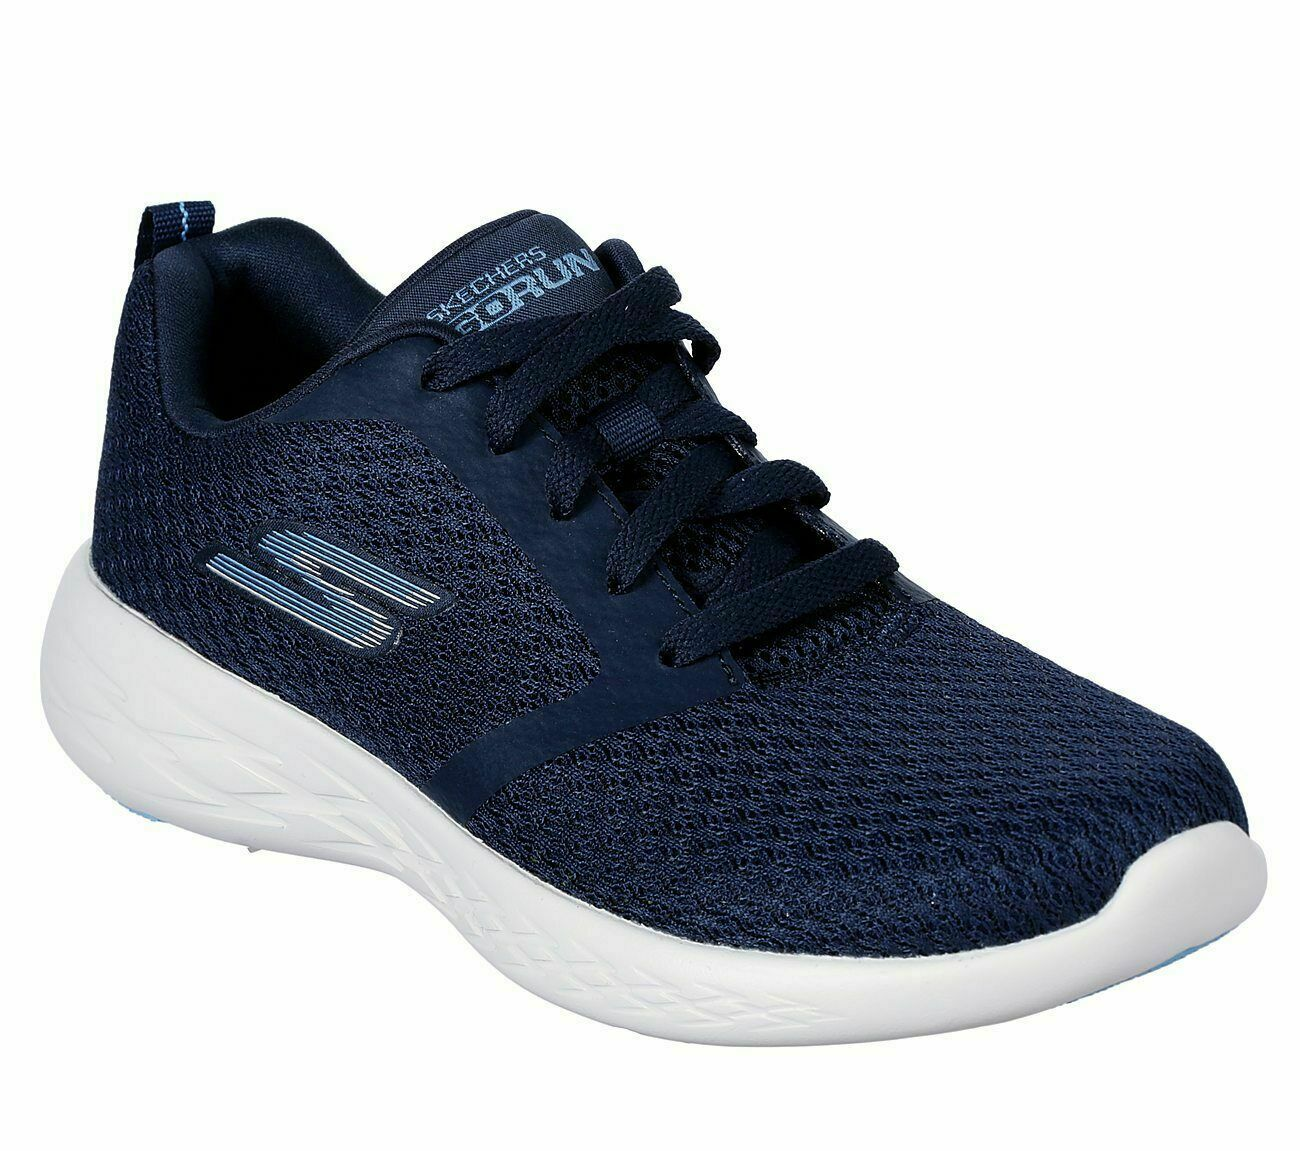 Zapatos Azul Marino blancoo Mujer Skechers Sport Ir Ejecutar Malla DEPORTIVOS ATLÉTICOS INFORMALES 15098 correr